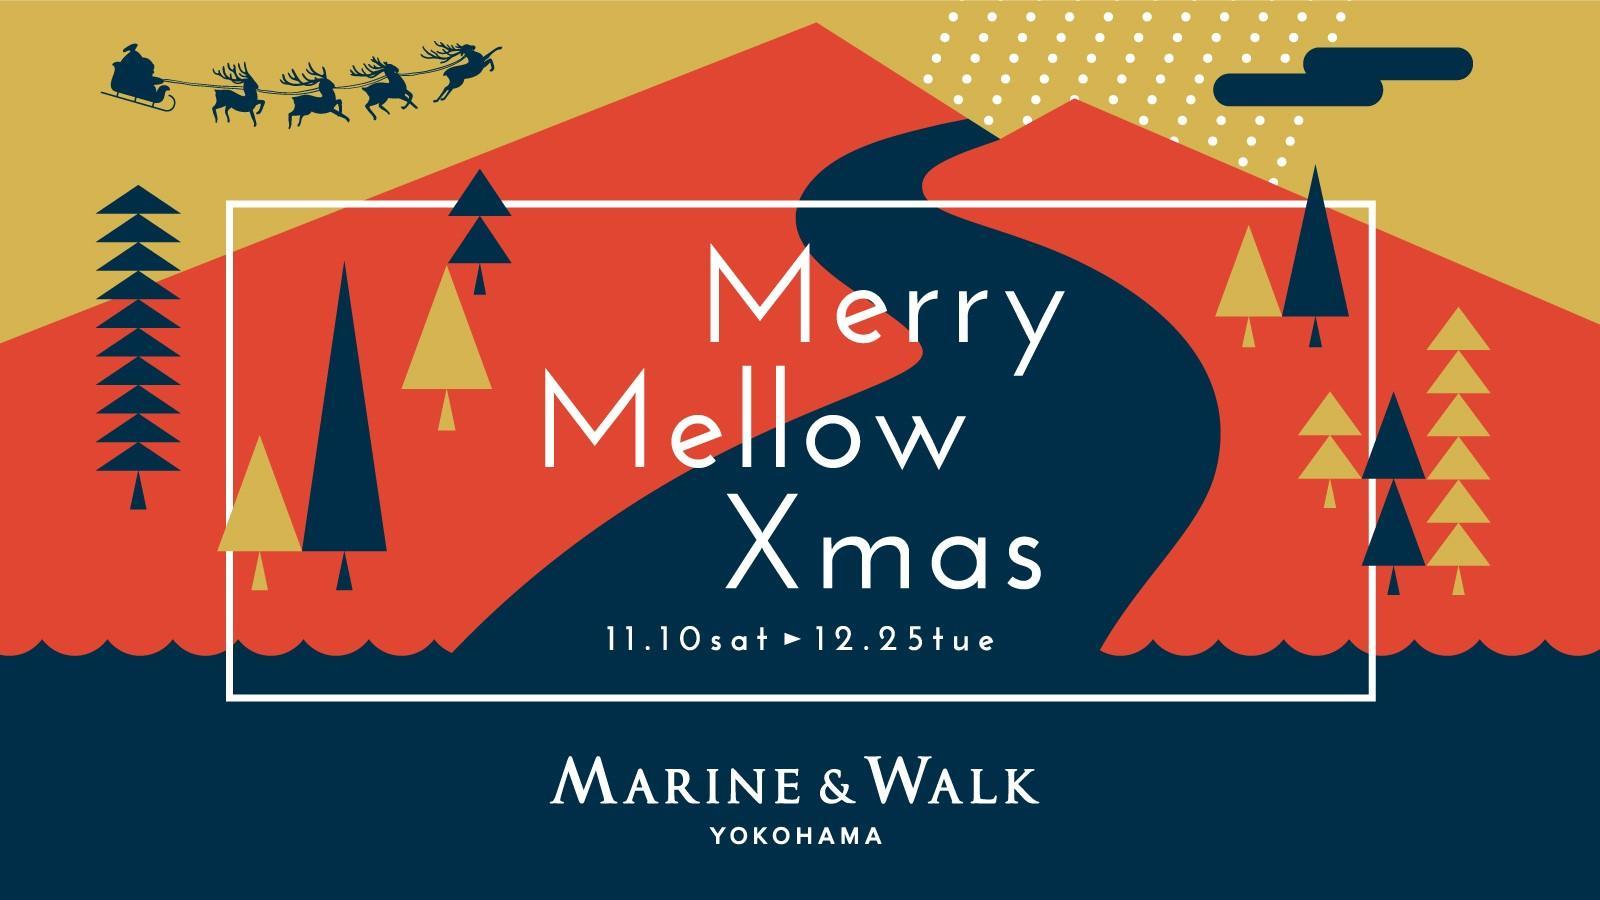 2018.11.10sat-12.25tue  Merry Mellow Xmas